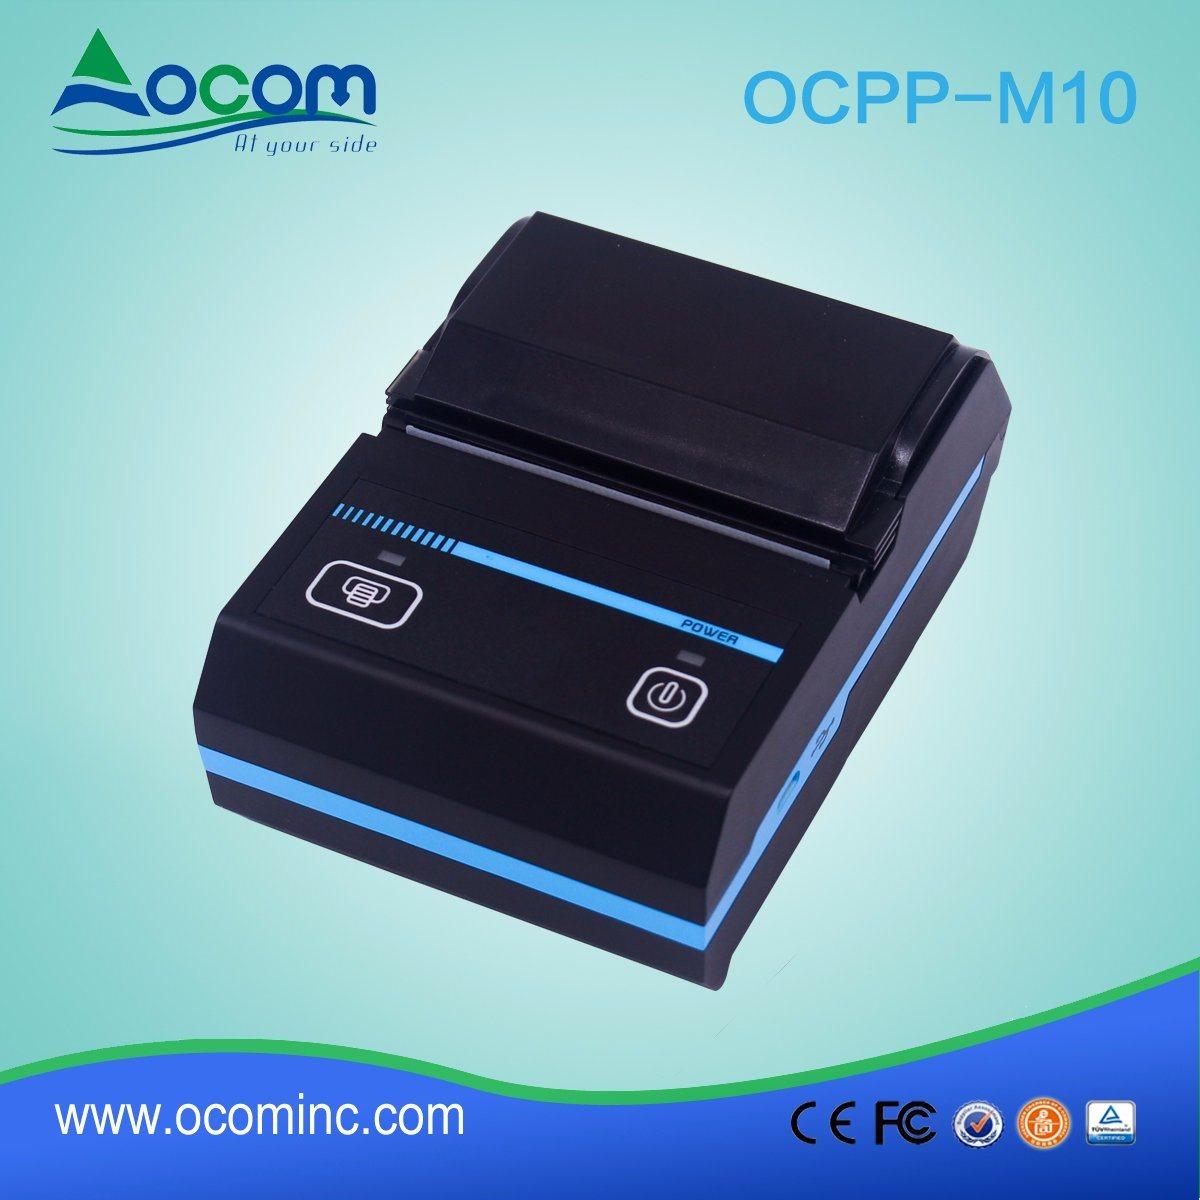 [Hot Item] 58mm Mini Wireless Android Bluetooth POS Receipt Thermal Printer